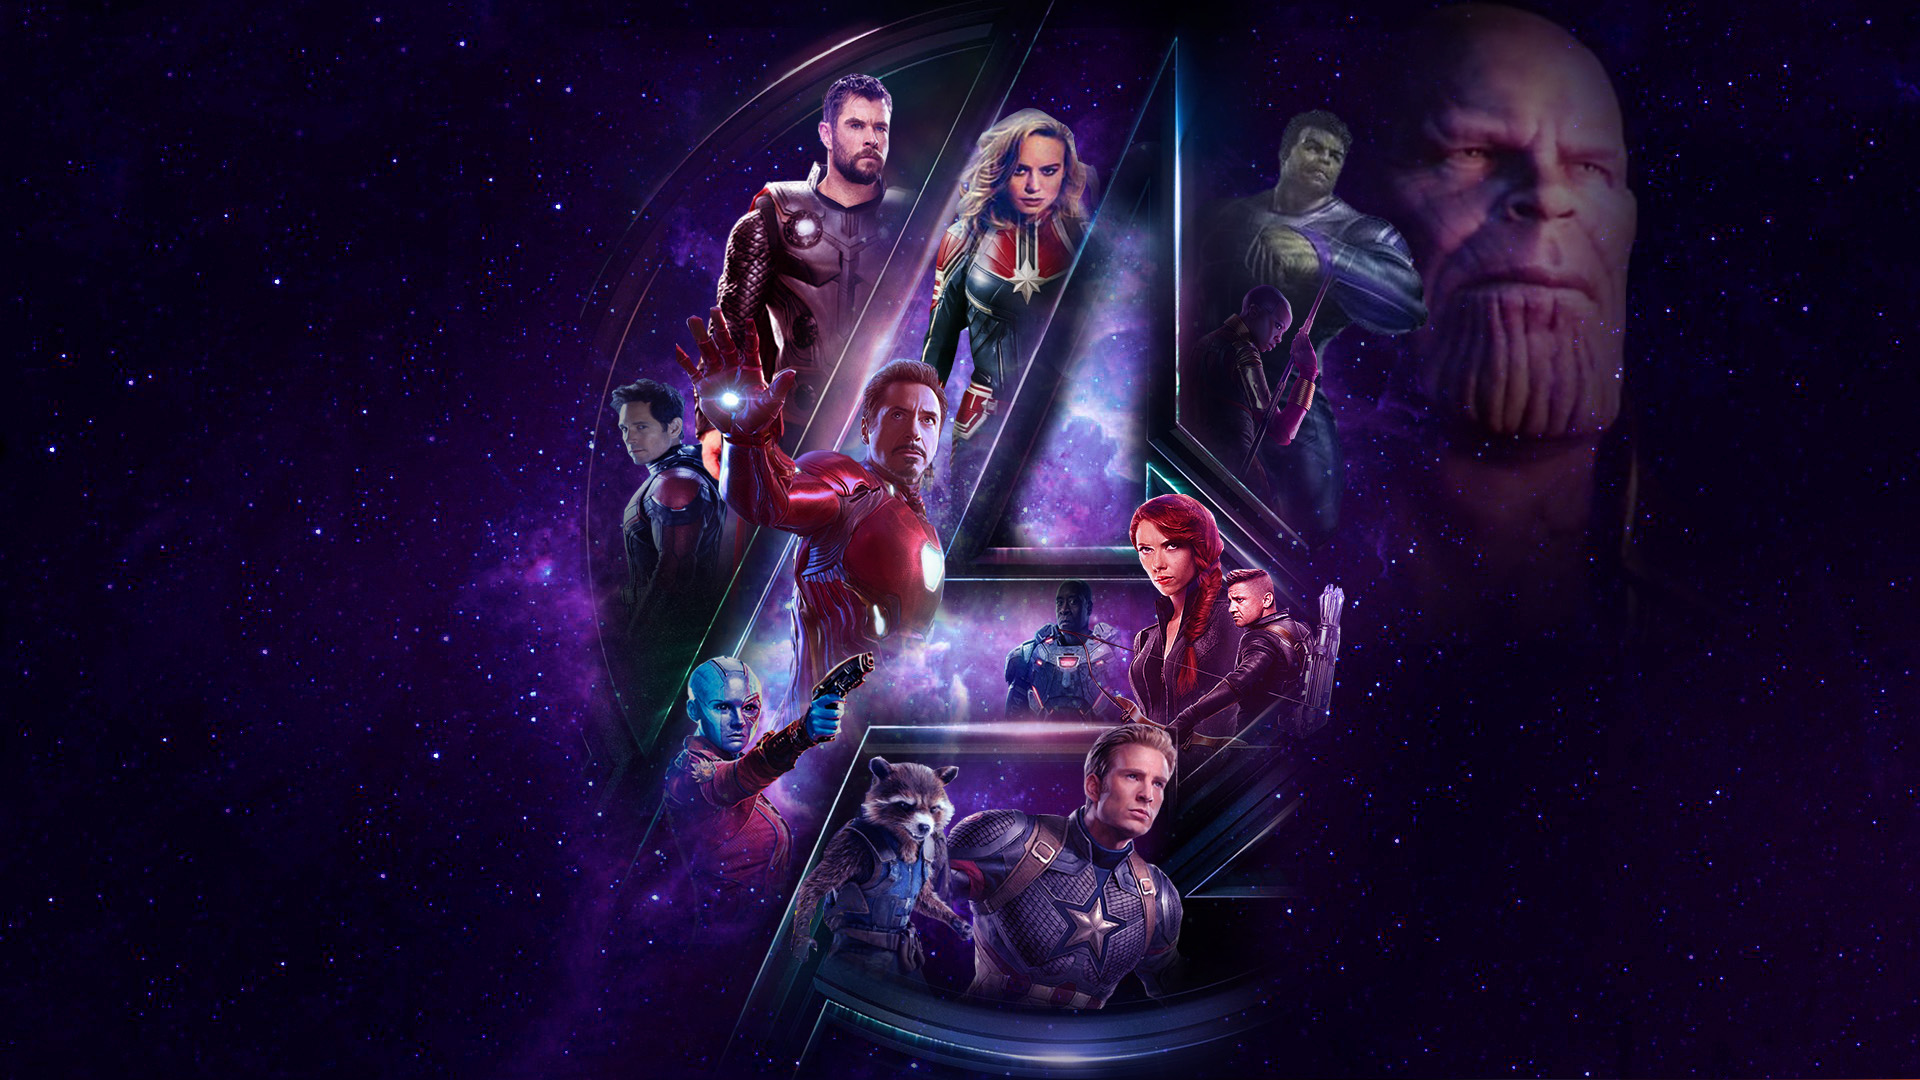 Avengers Backgrounds Tumblr – Wonderful Image Gallery